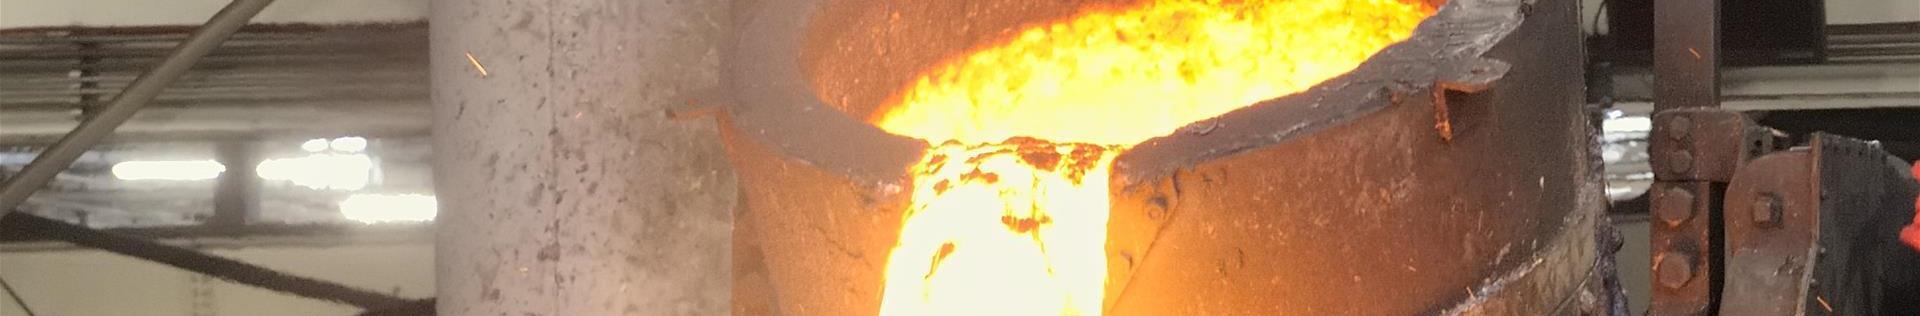 Hot molten metal